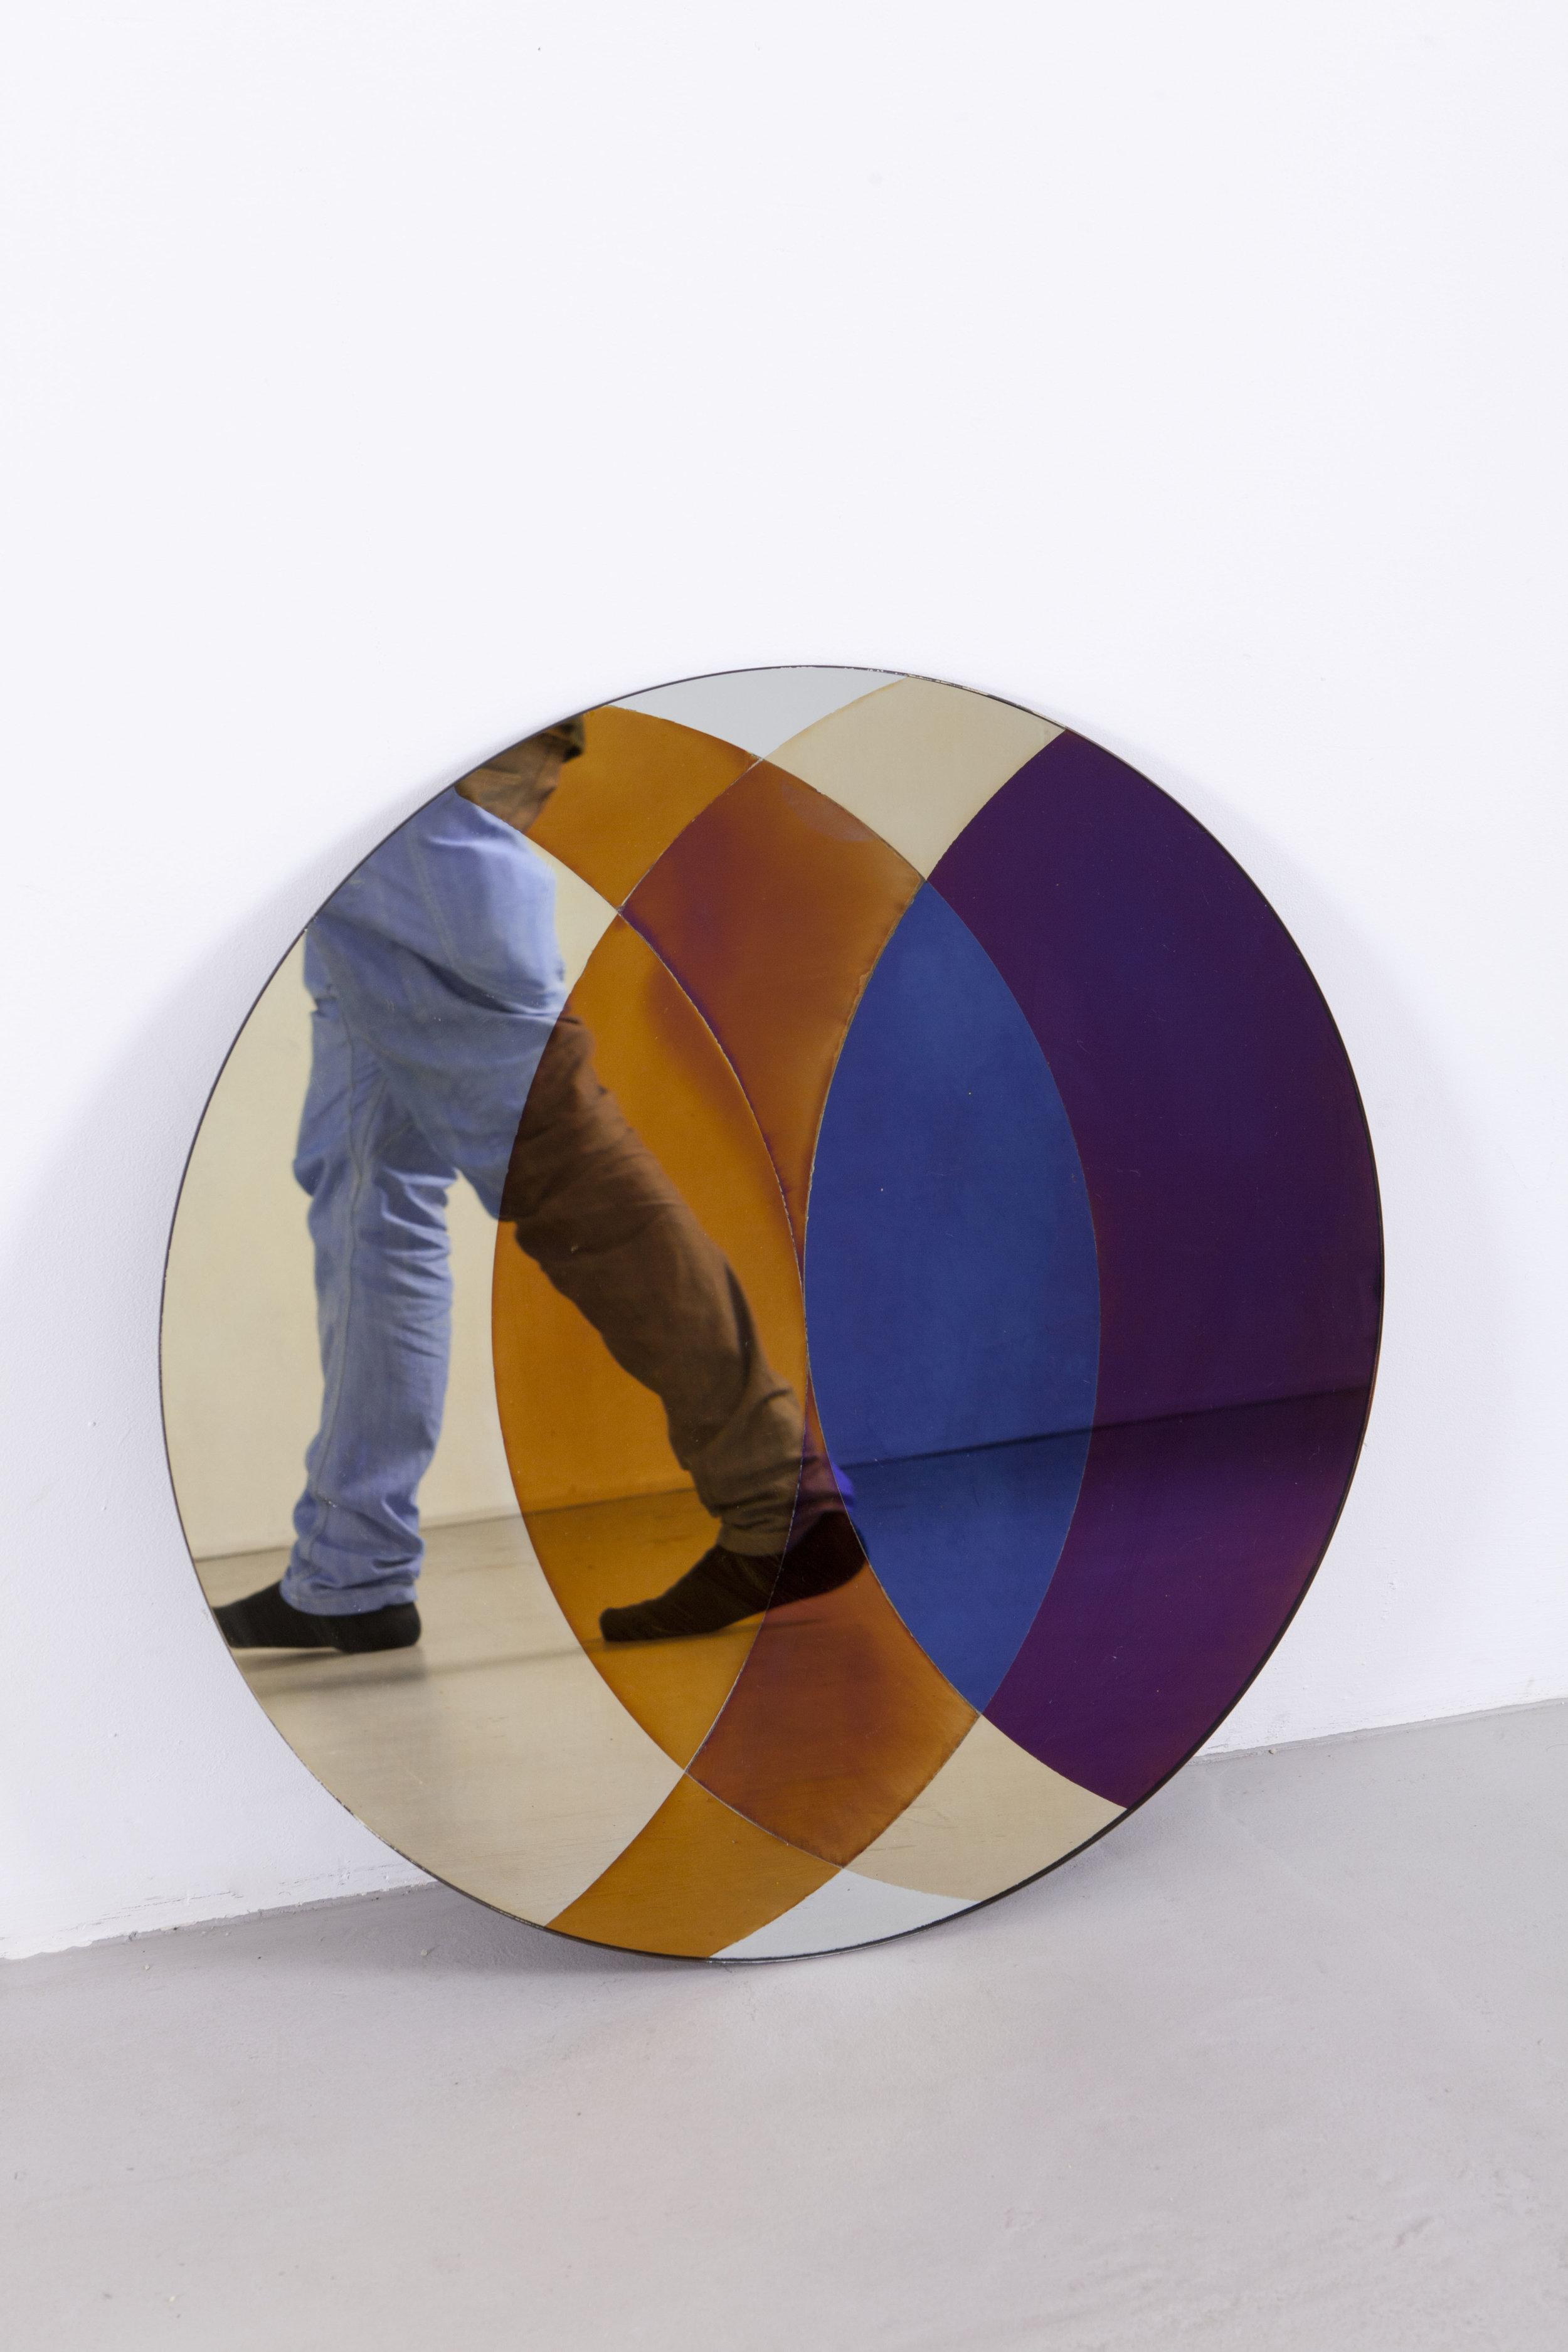 transnatural_Transience_mirror_circle+feet_byfloorknaapen_26.jpg